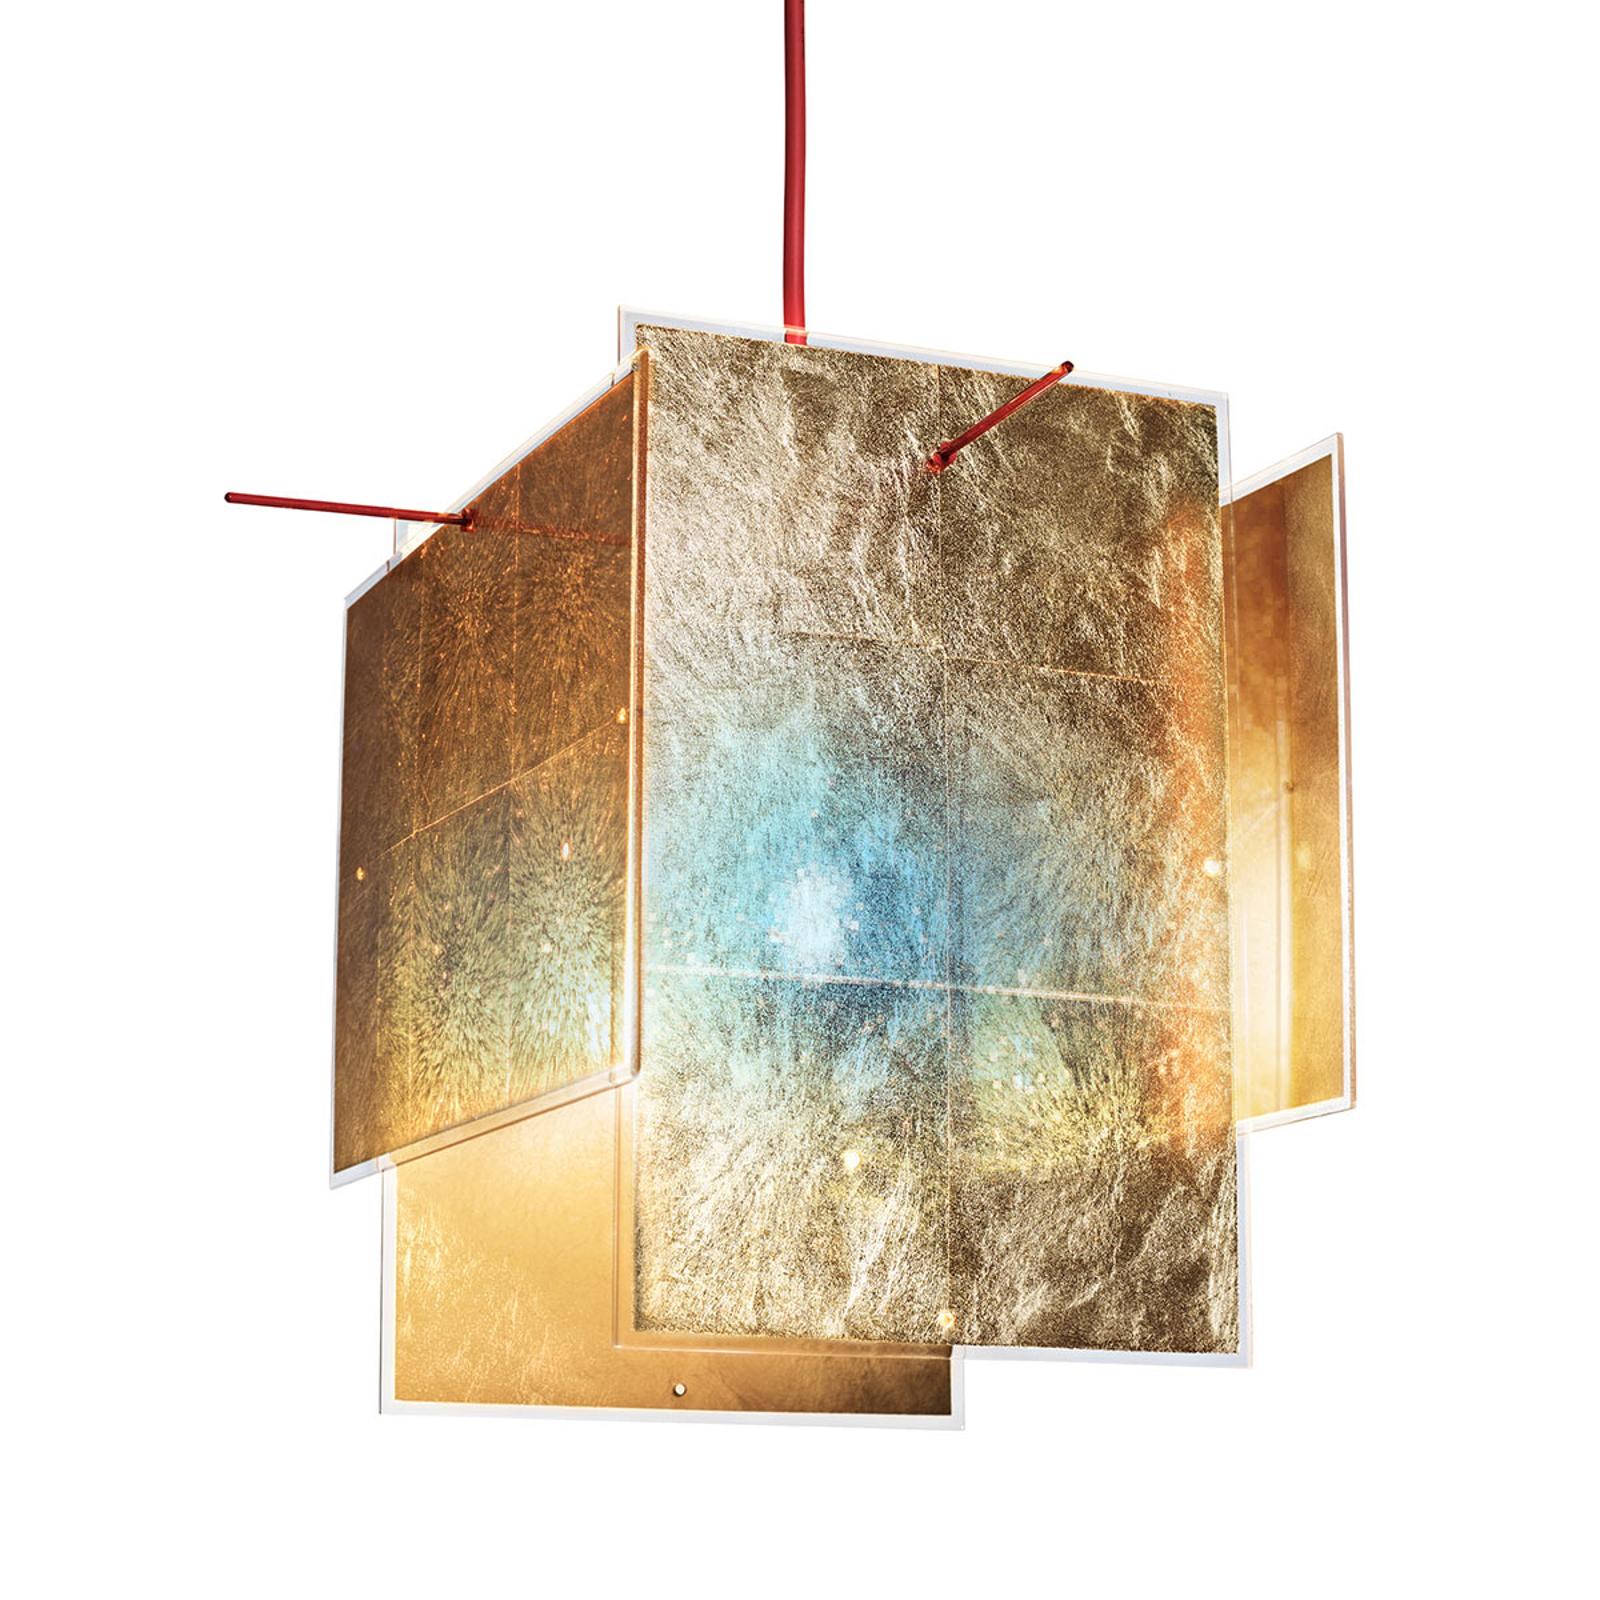 Suspension de designer dorée 24 carats 450 cm